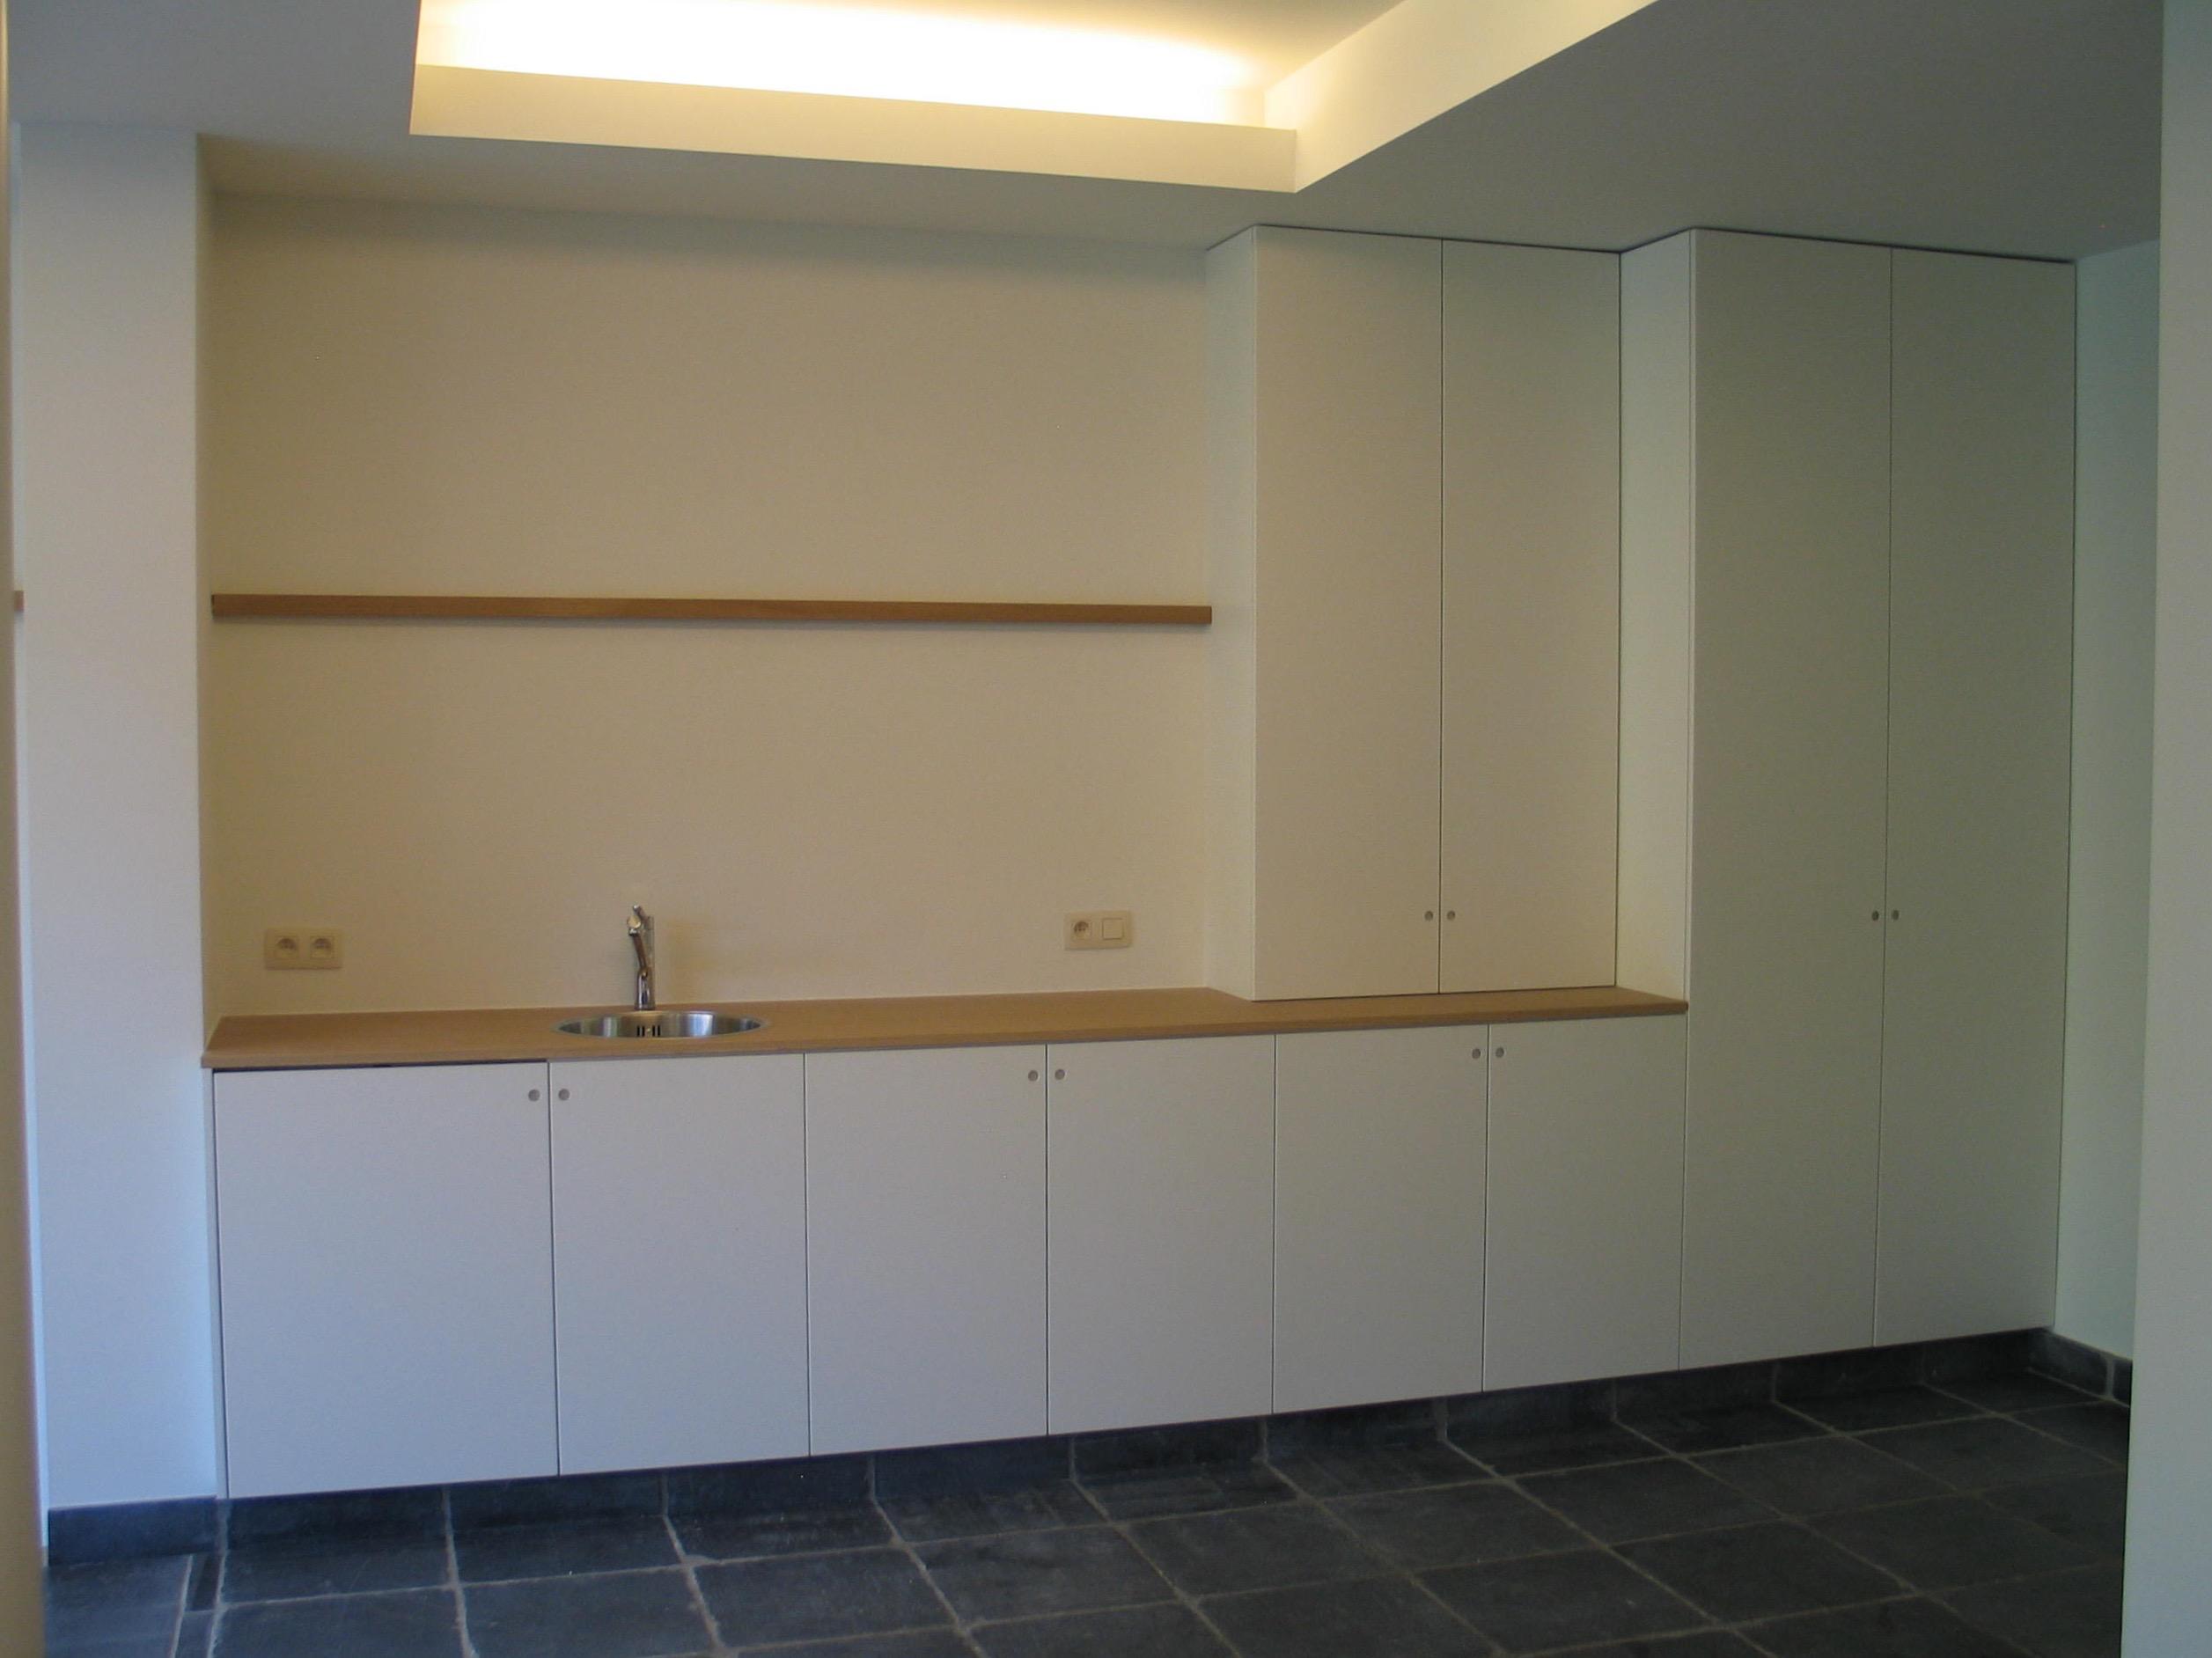 Bookcases  Frits Kuitenbrouwer Tailormade Furniture # Wasbak Blokjes_014242